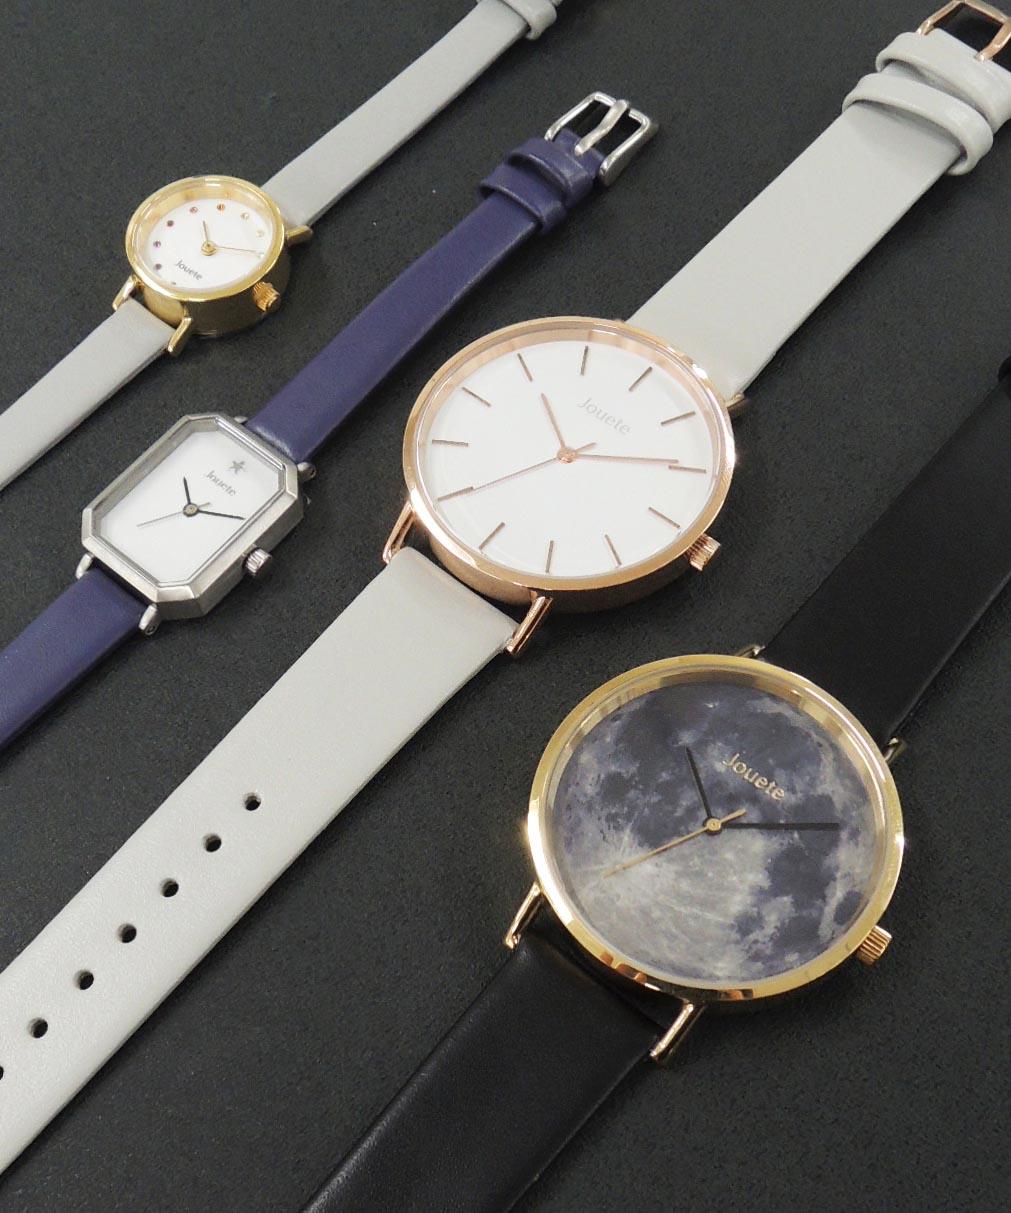 421146380e Jouete ジュエッテのトピックス「【本日締切】大人気の腕時計第2弾 ...